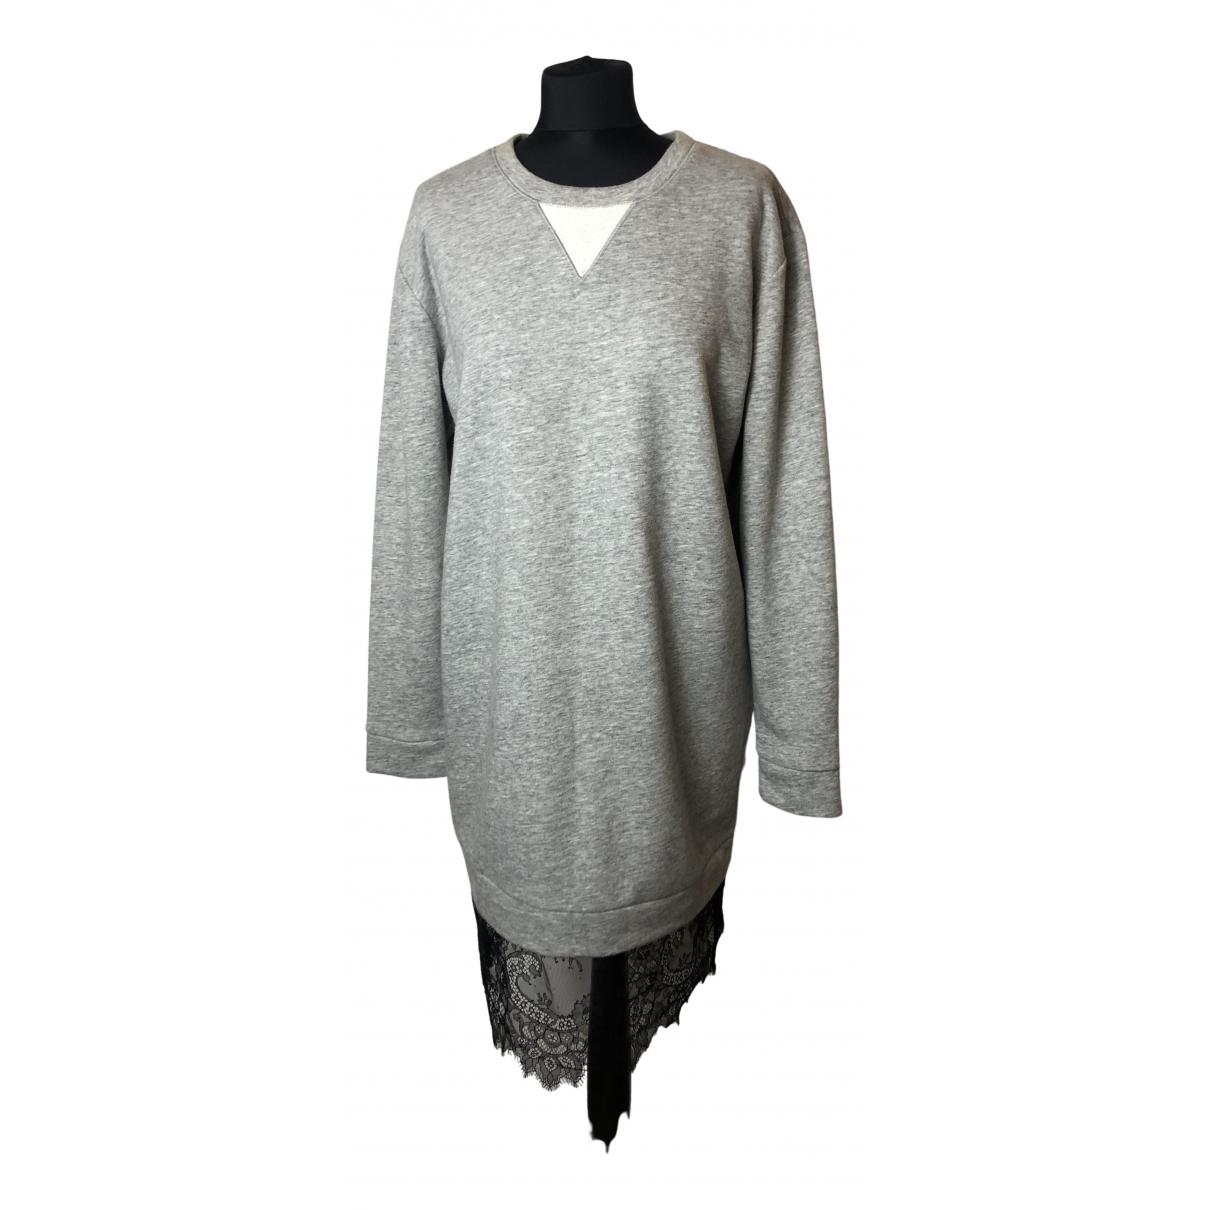 Bcbg Max Azria \N Grey Cotton dress for Women M International